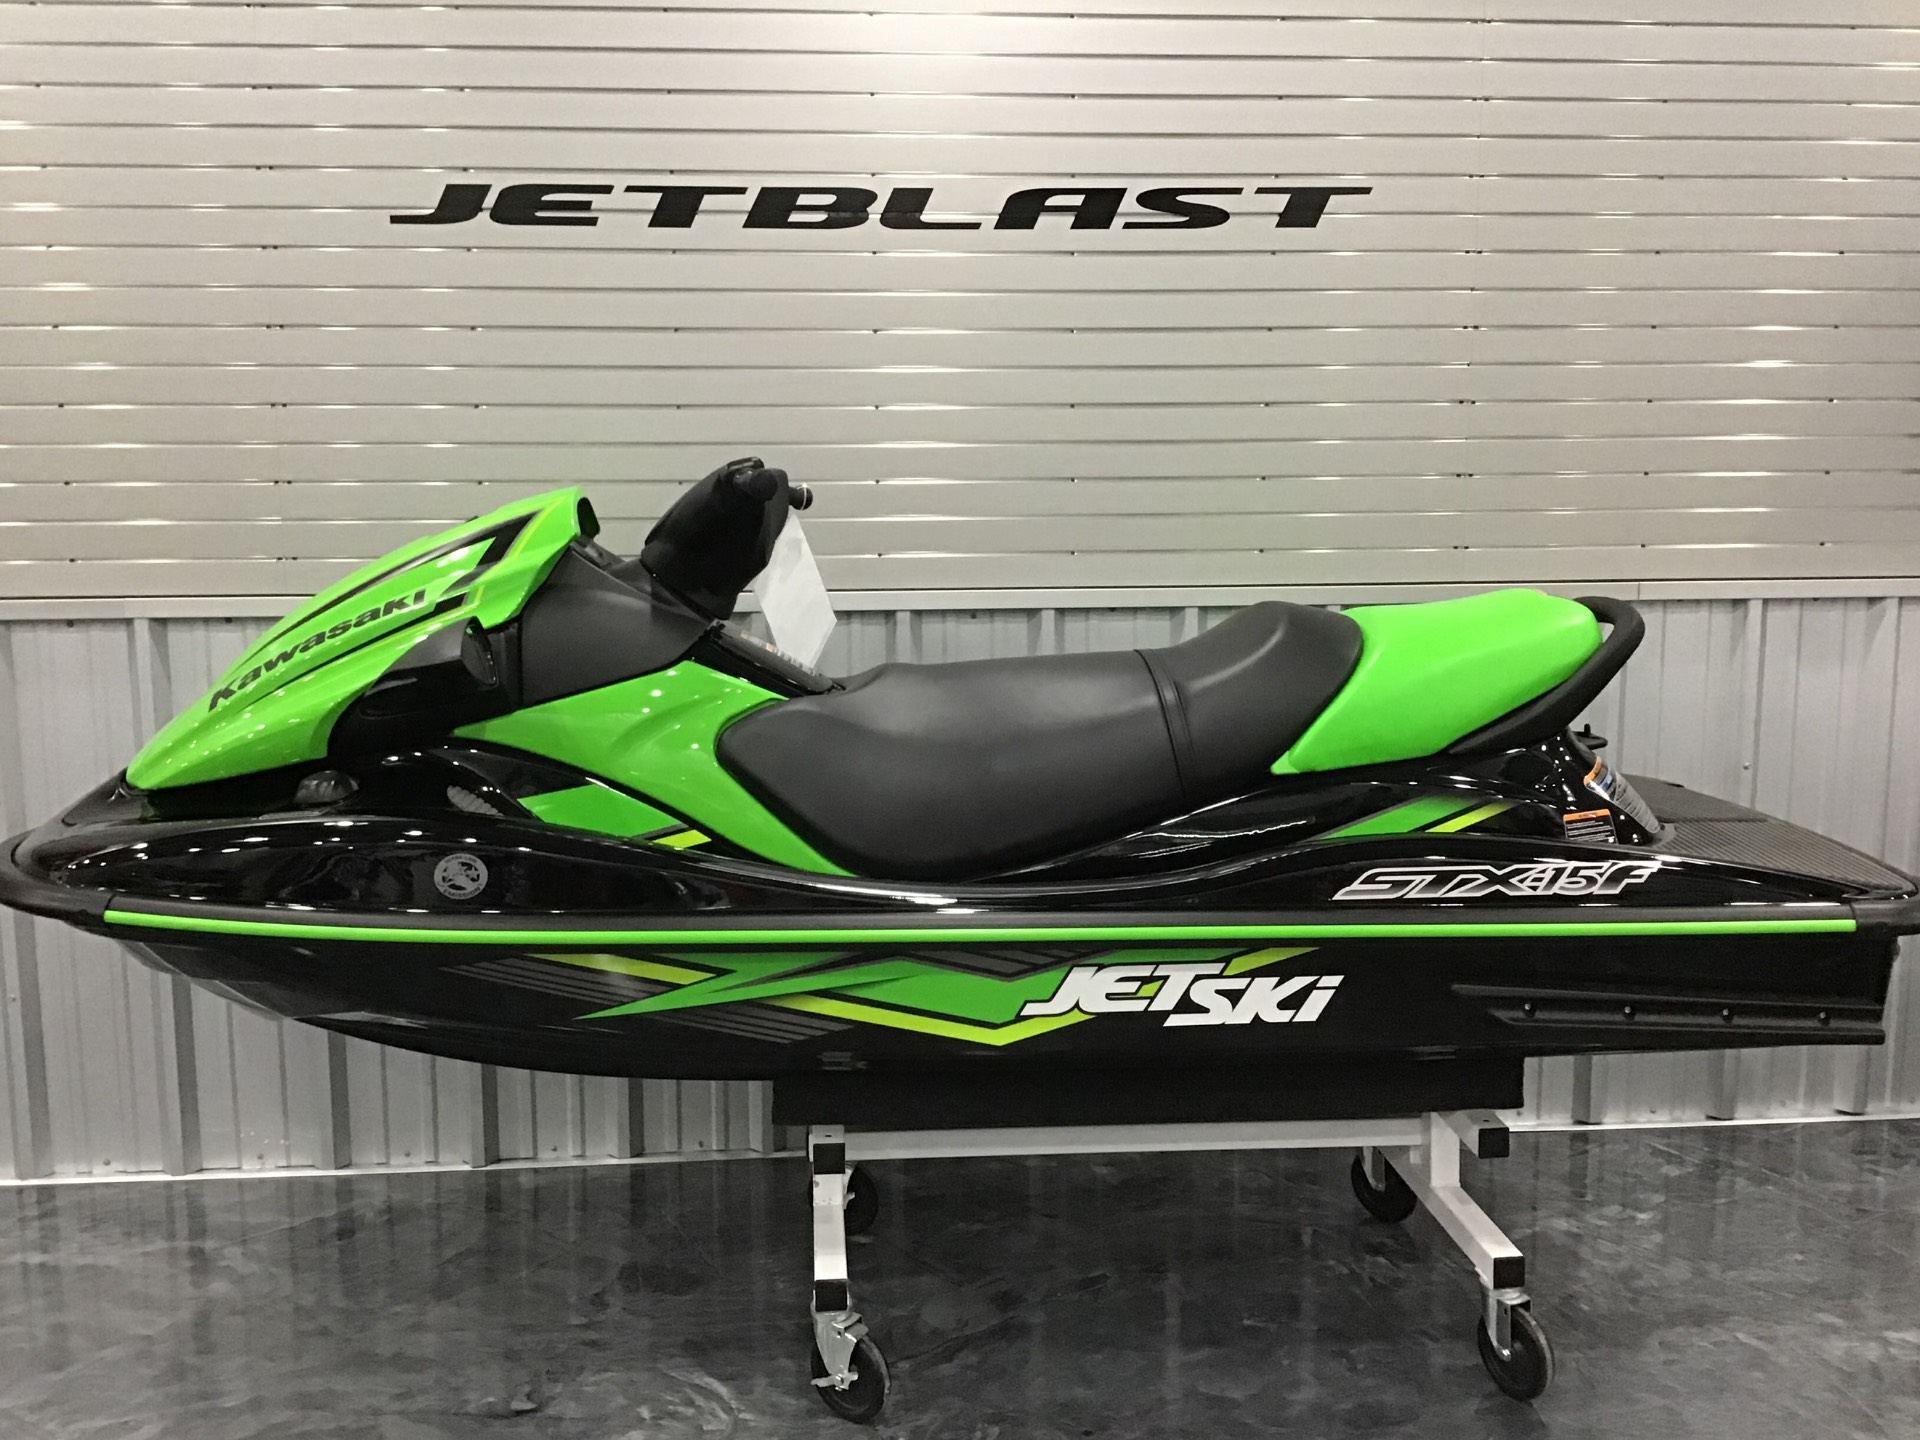 2019 Kawasaki Jet Ski STX-15F in Gulfport, Mississippi